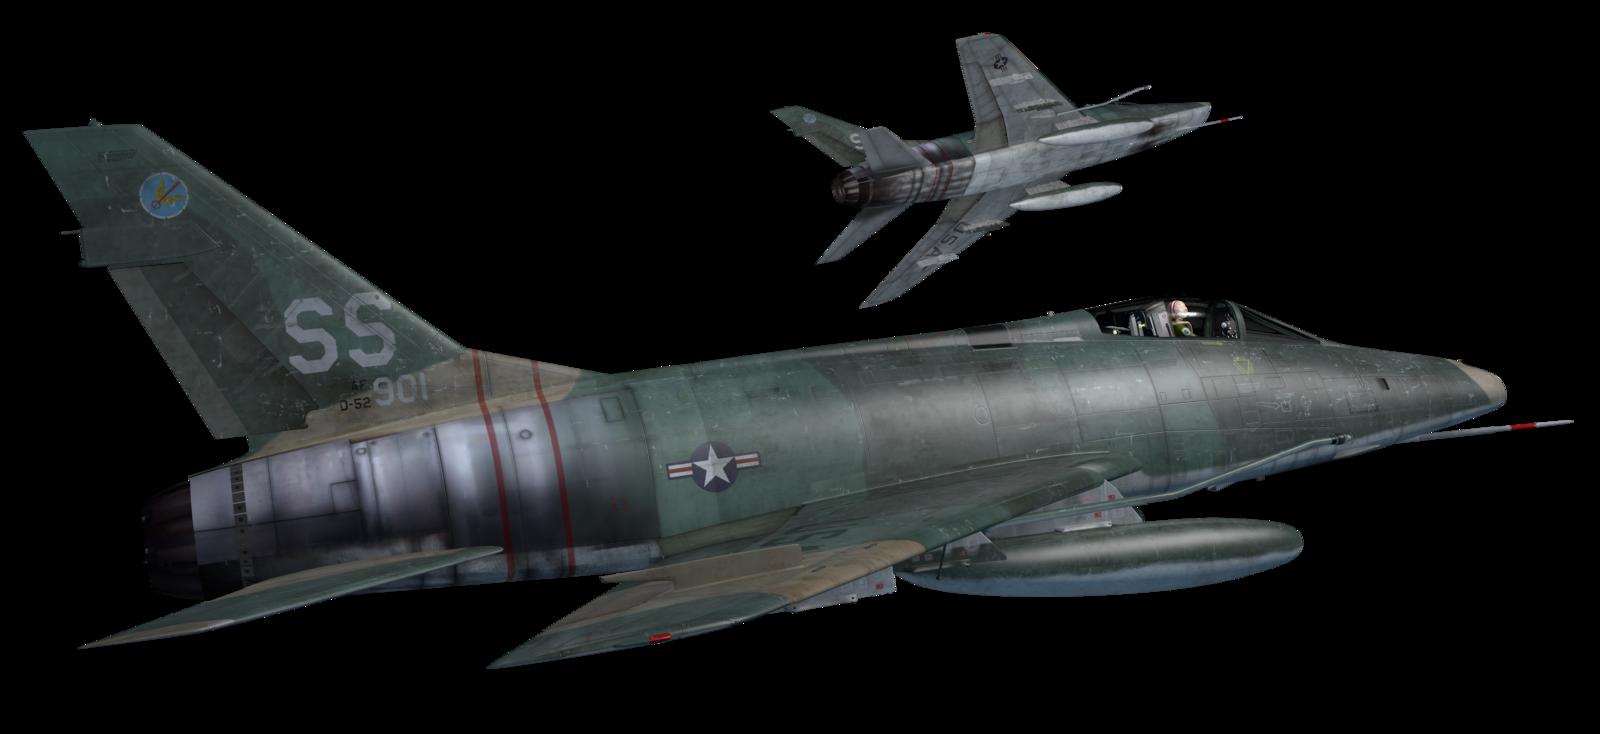 Fallout, Air Force, Aircraft,